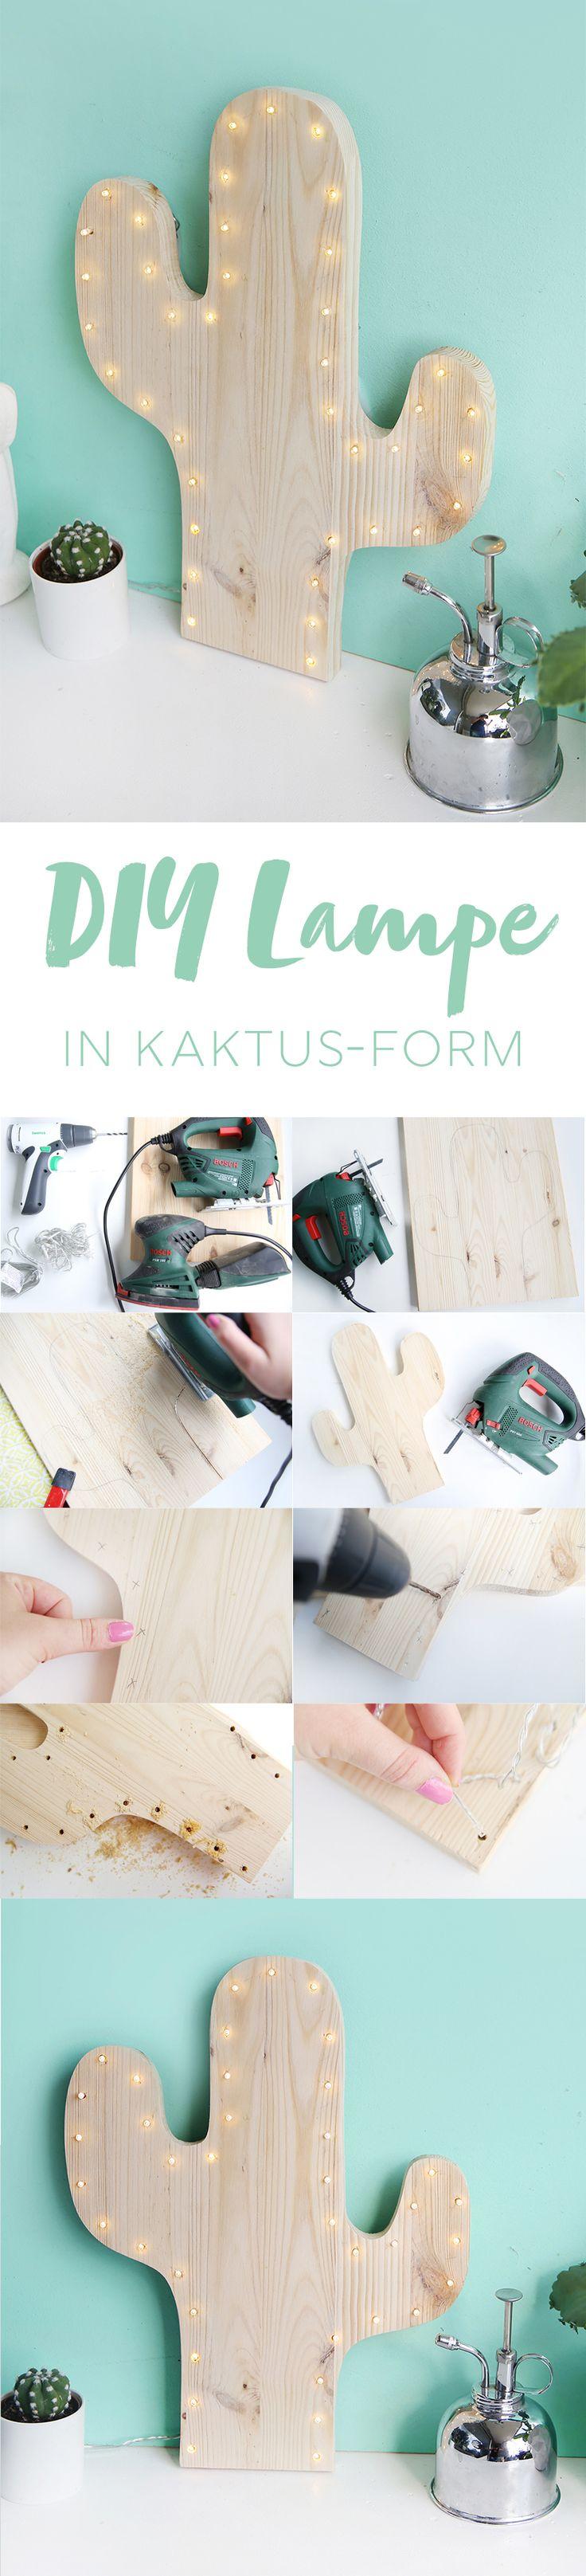 Kreative DIY-Idee zum Selbermachen: Kaktus-Lampe selbstgemacht mit LEDs und Kiefernholz | DIY Anleitung | DIY Tutorial | Cactus Lamp | DIY Blog